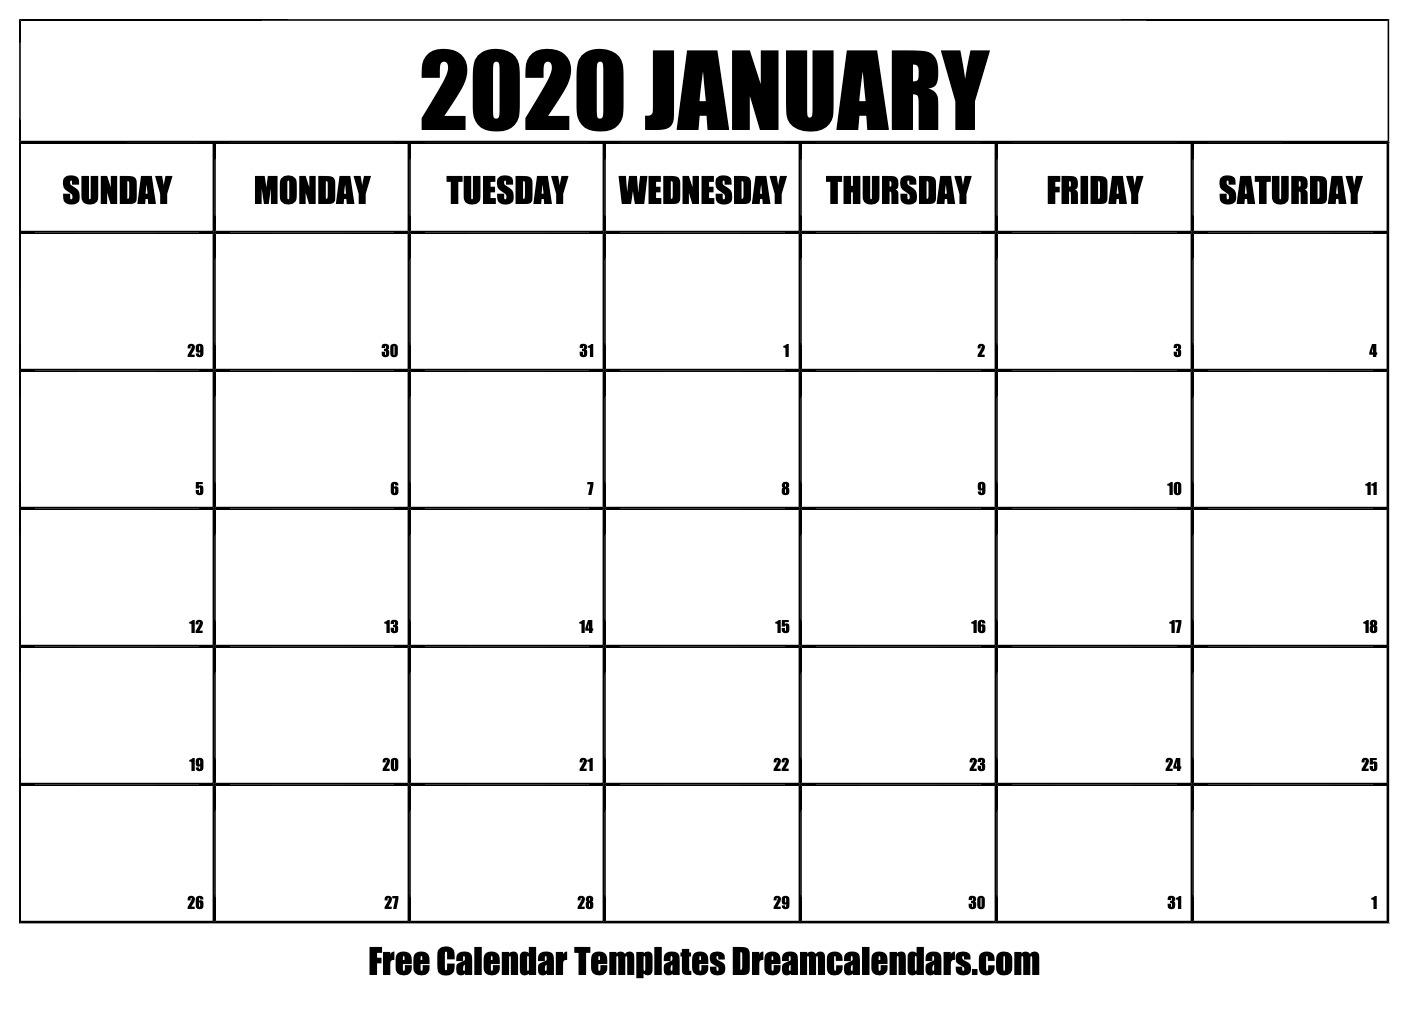 Printable January 2020 Calendar with regard to 2020 Printable Calendar Free That Start With Monday